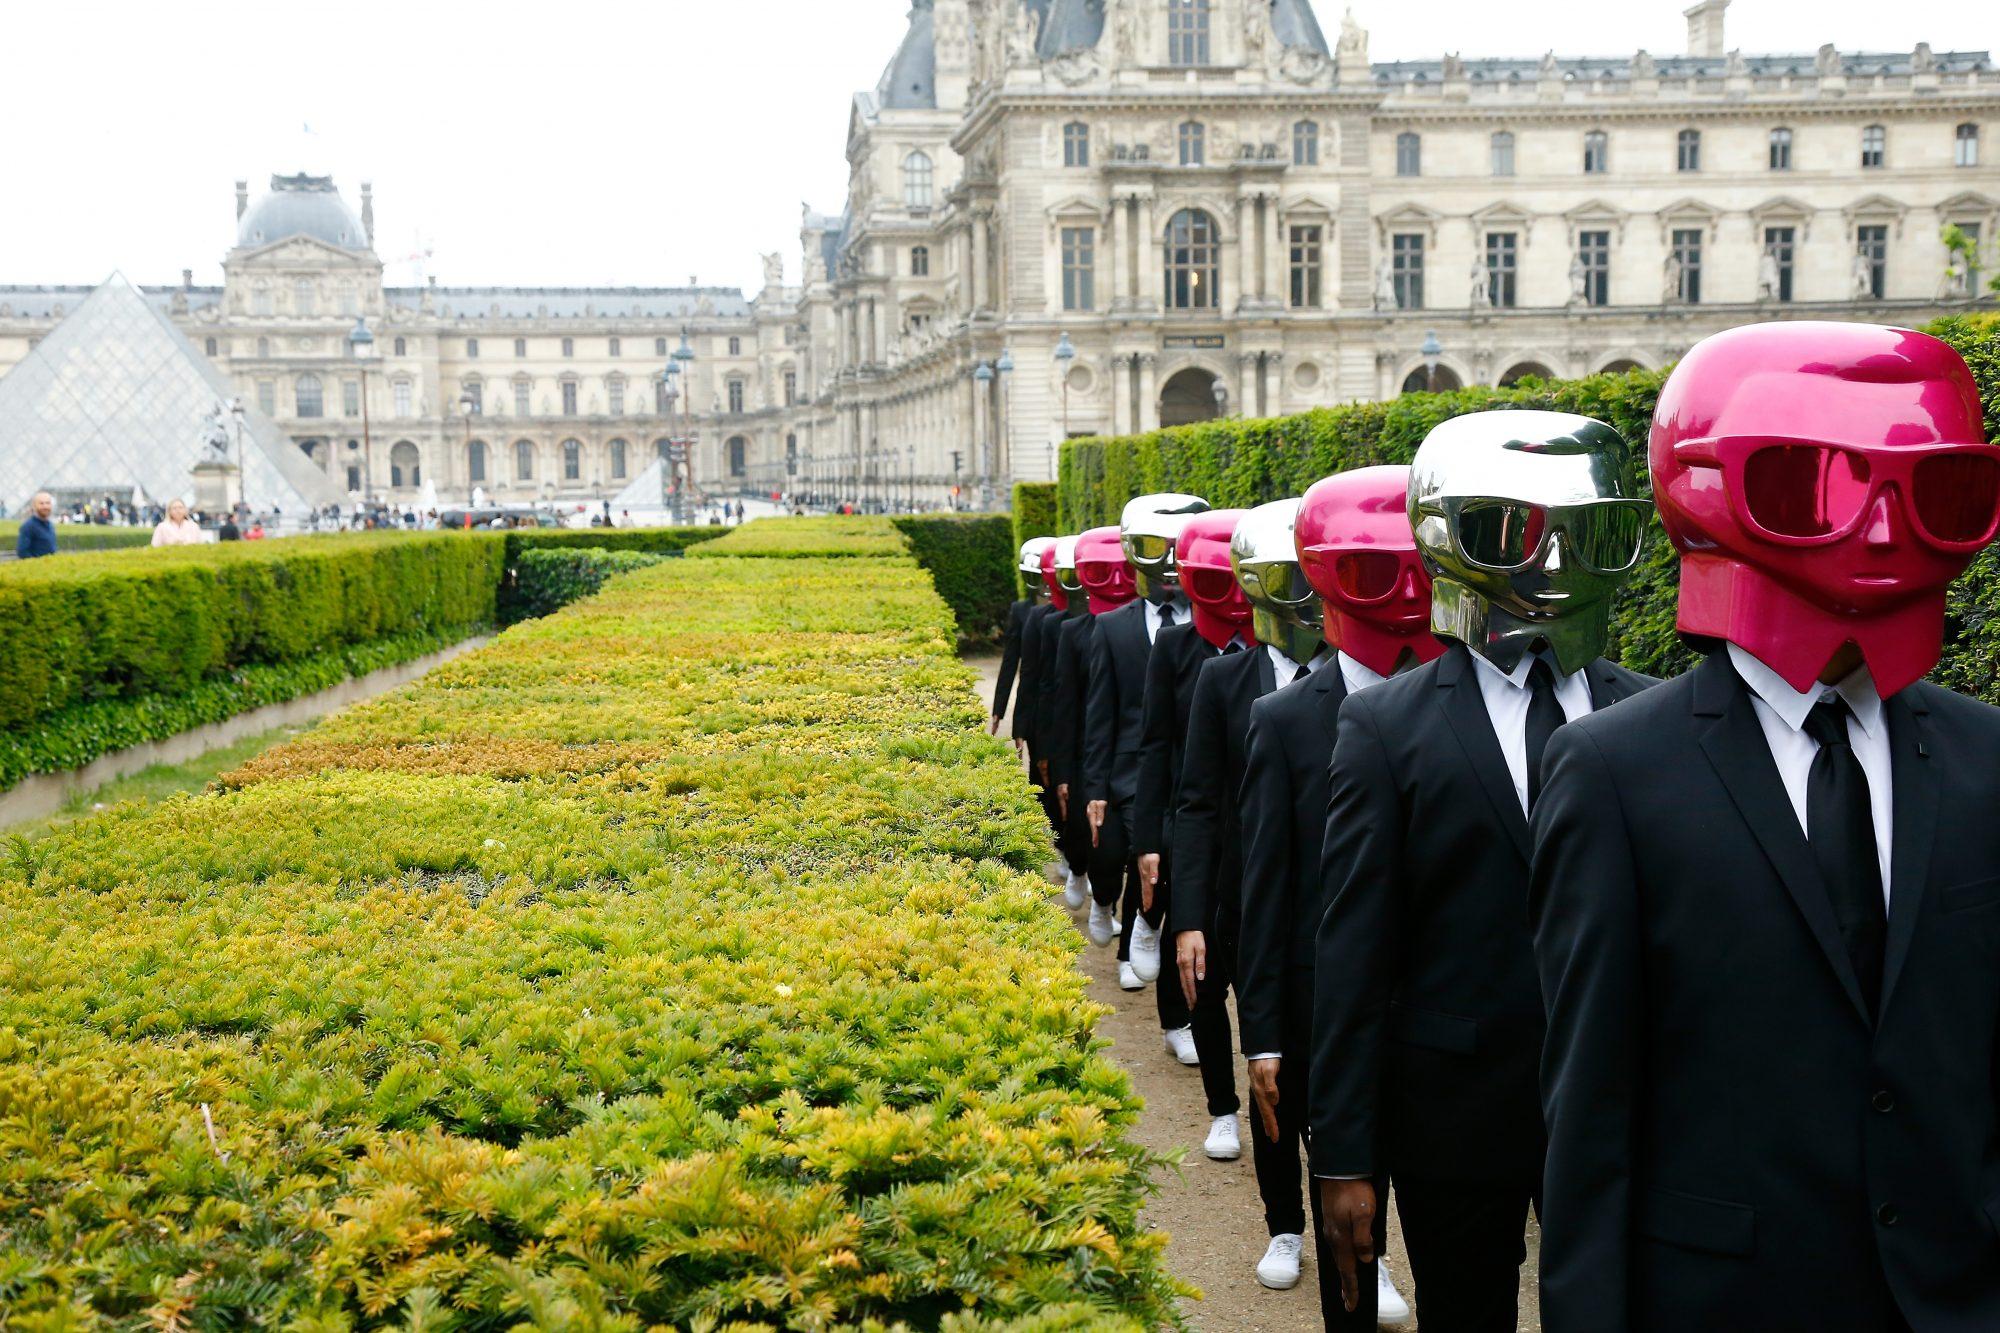 Karl Lagerfeld, coleccion, maquillaje, paris, modelco